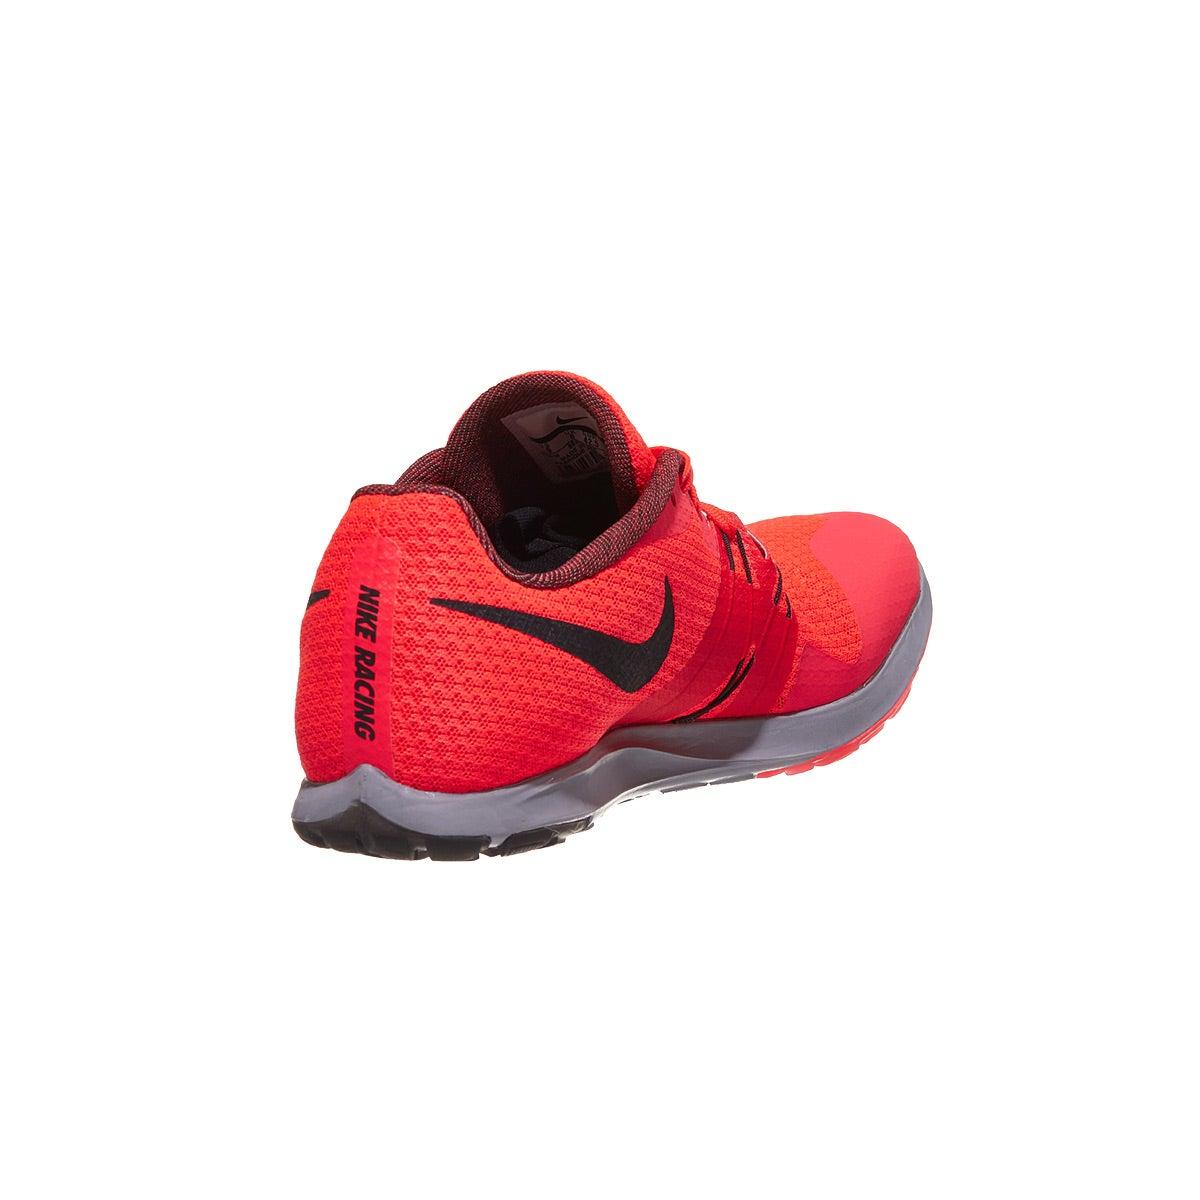 buy popular 0ec2b c2fda Nike Zoom Rival XC Men s Spikes Flash Crimson Oil Grey 360° View   Running  Warehouse.